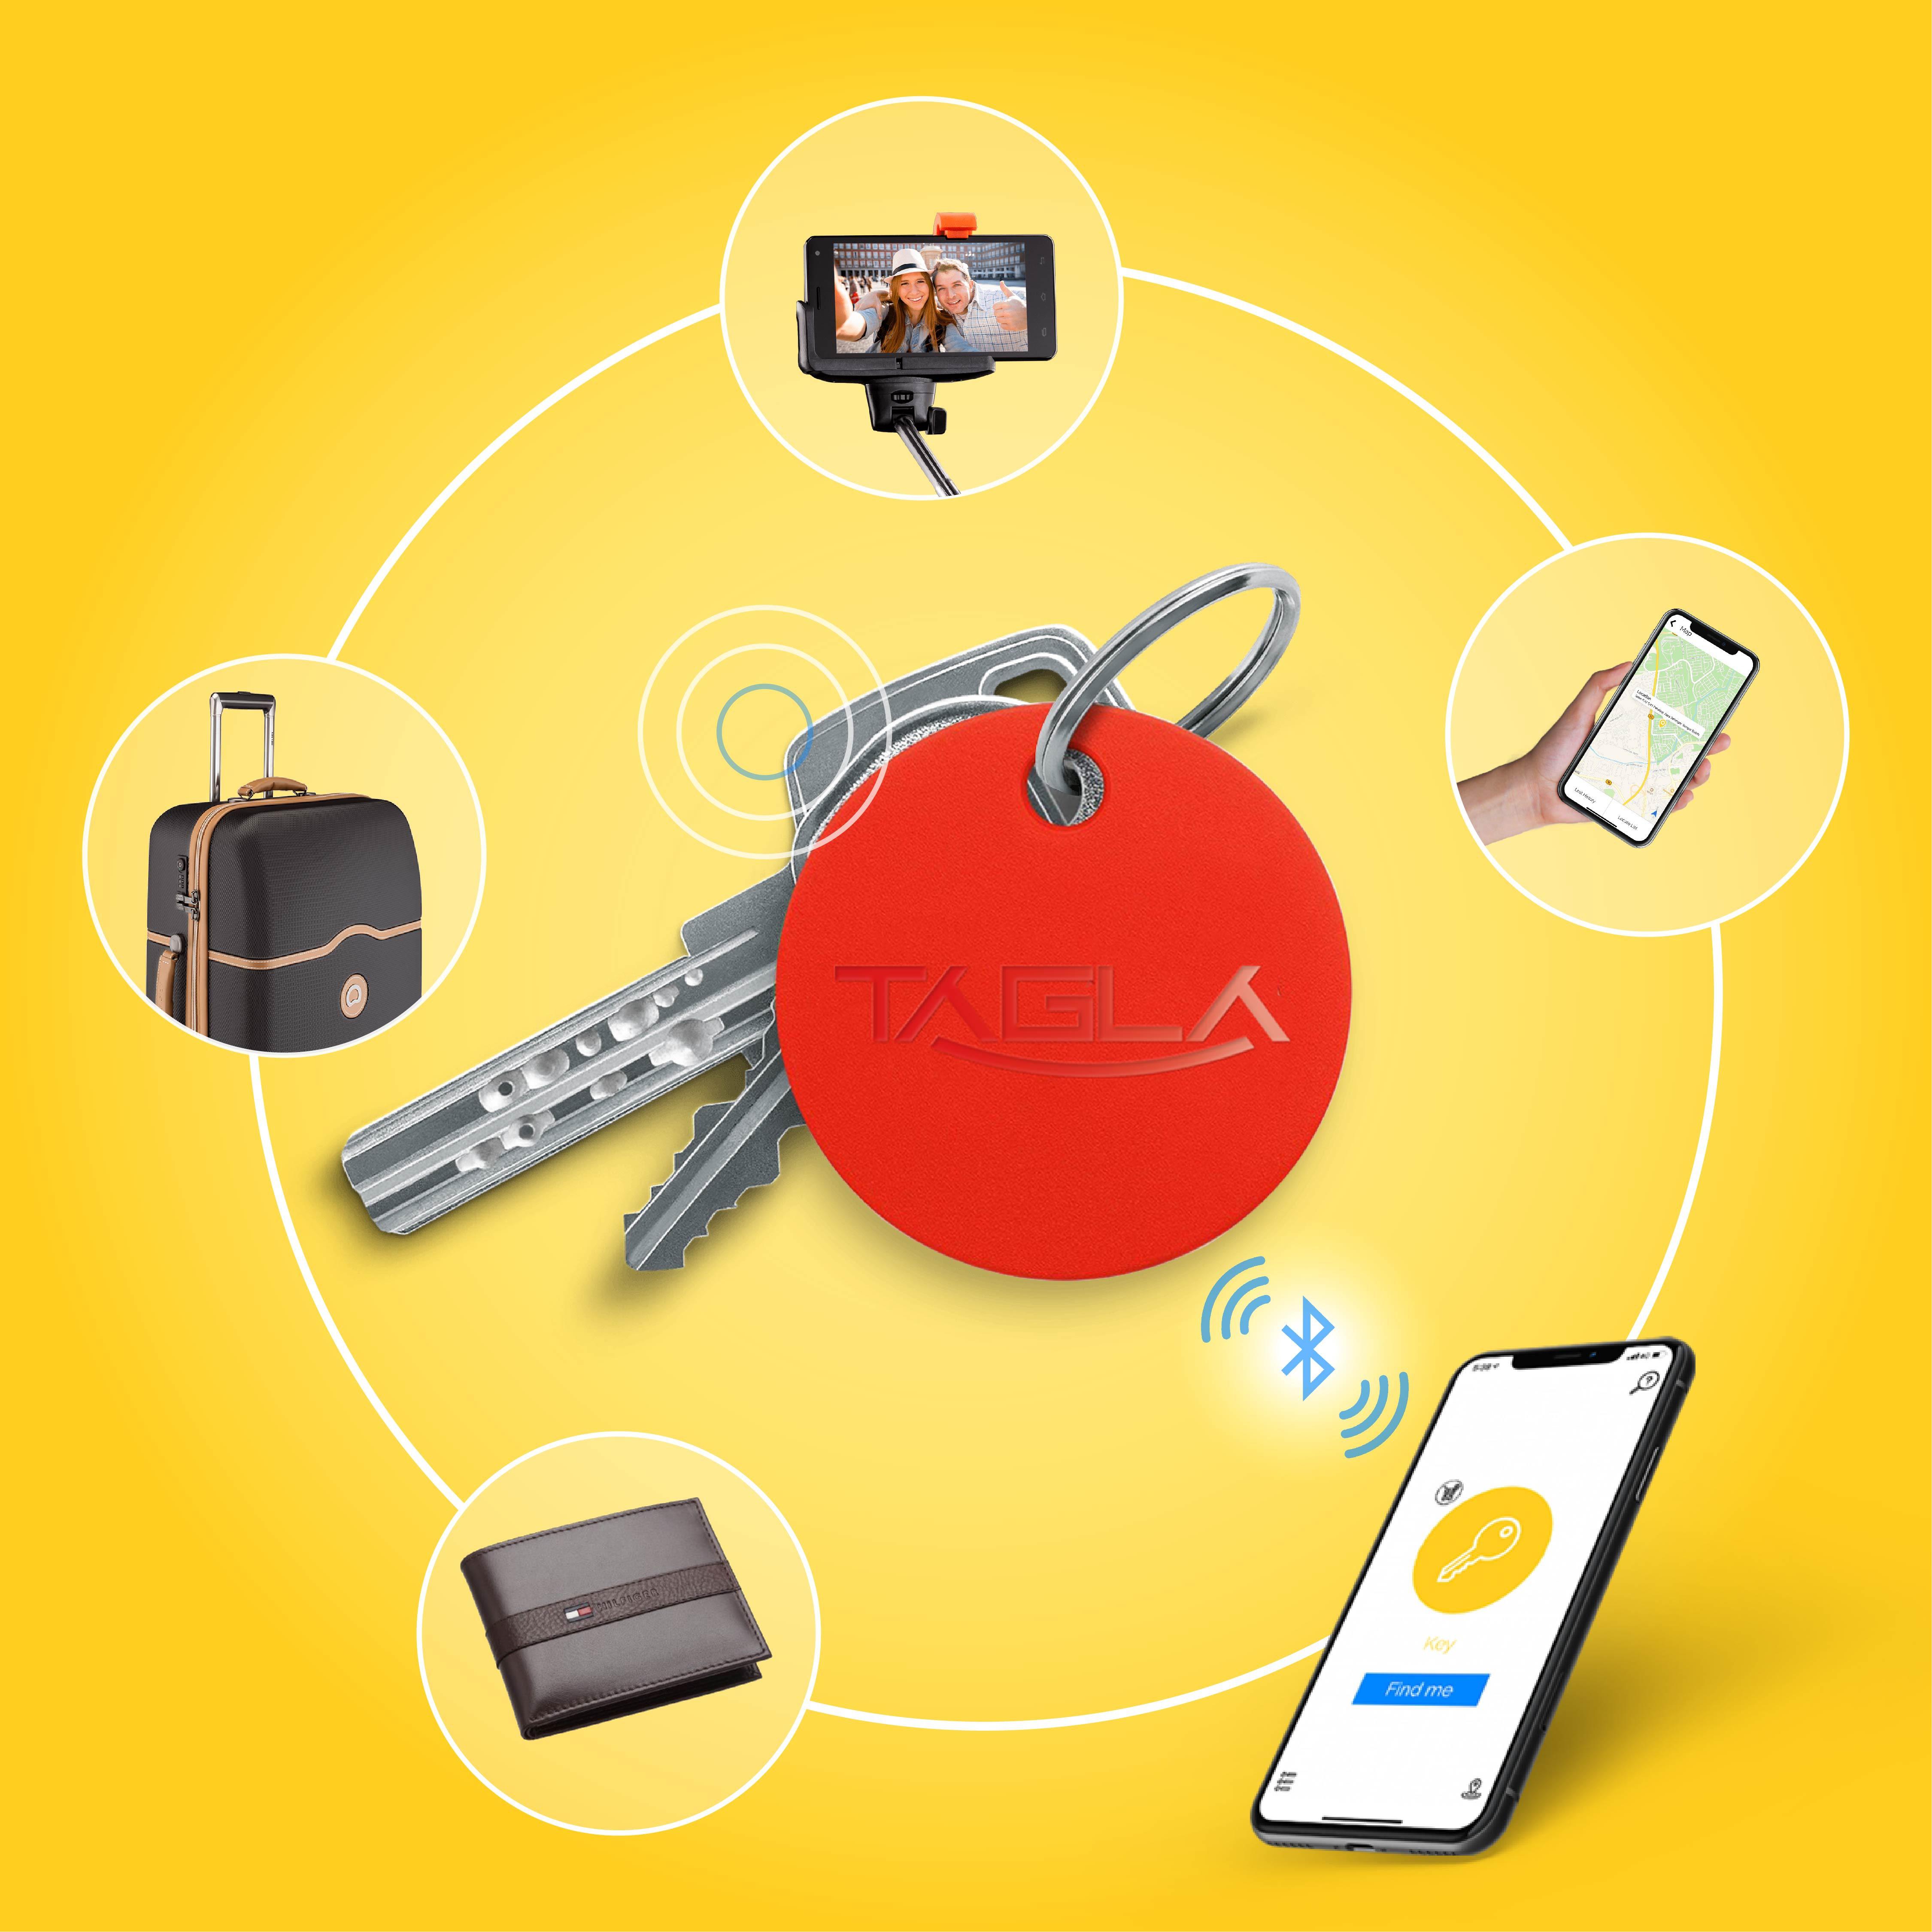 TAG La V2 Bluetooth Tracker Key Finder Item Finder Anti lost alarm device for Security-Key Locator, Wallet Tracker, Phone Finder, Selfie Remote (Red)